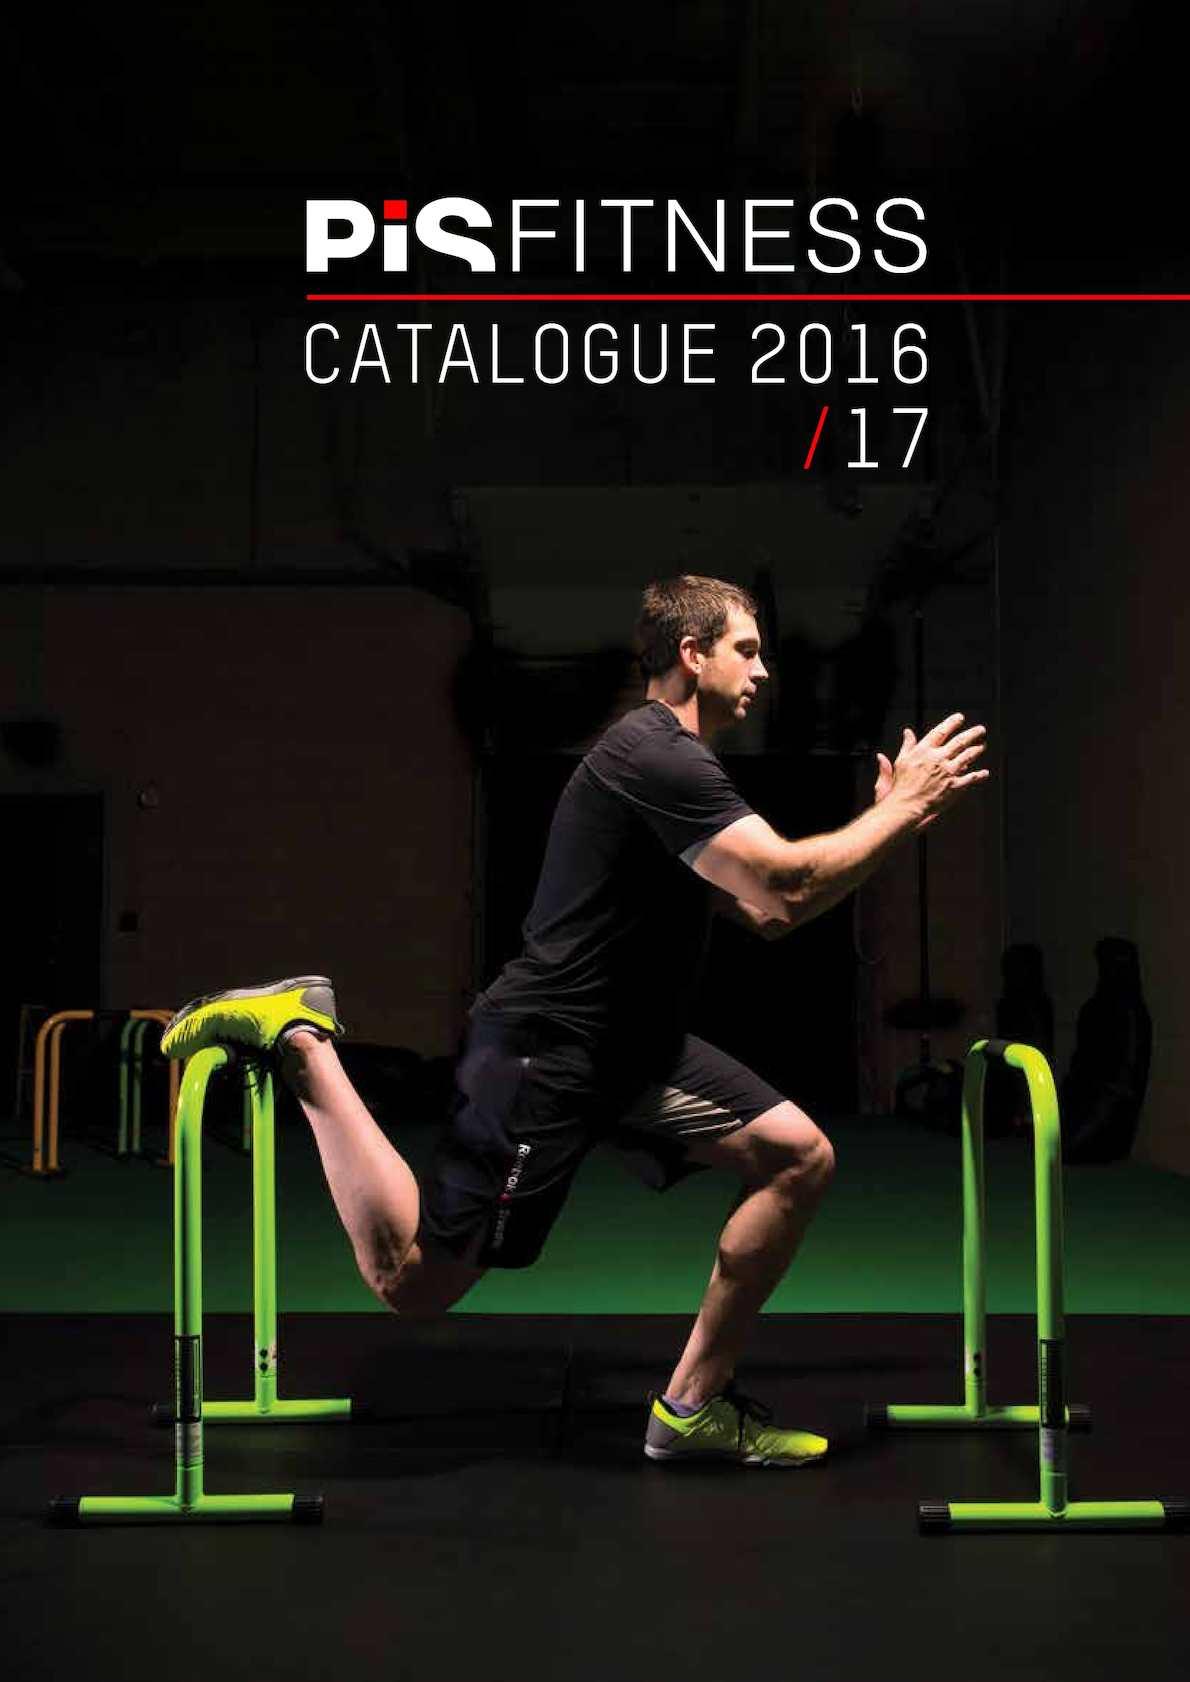 2X Wooden ring crossfit gymnastics rings shoulder strength training equipment 4H